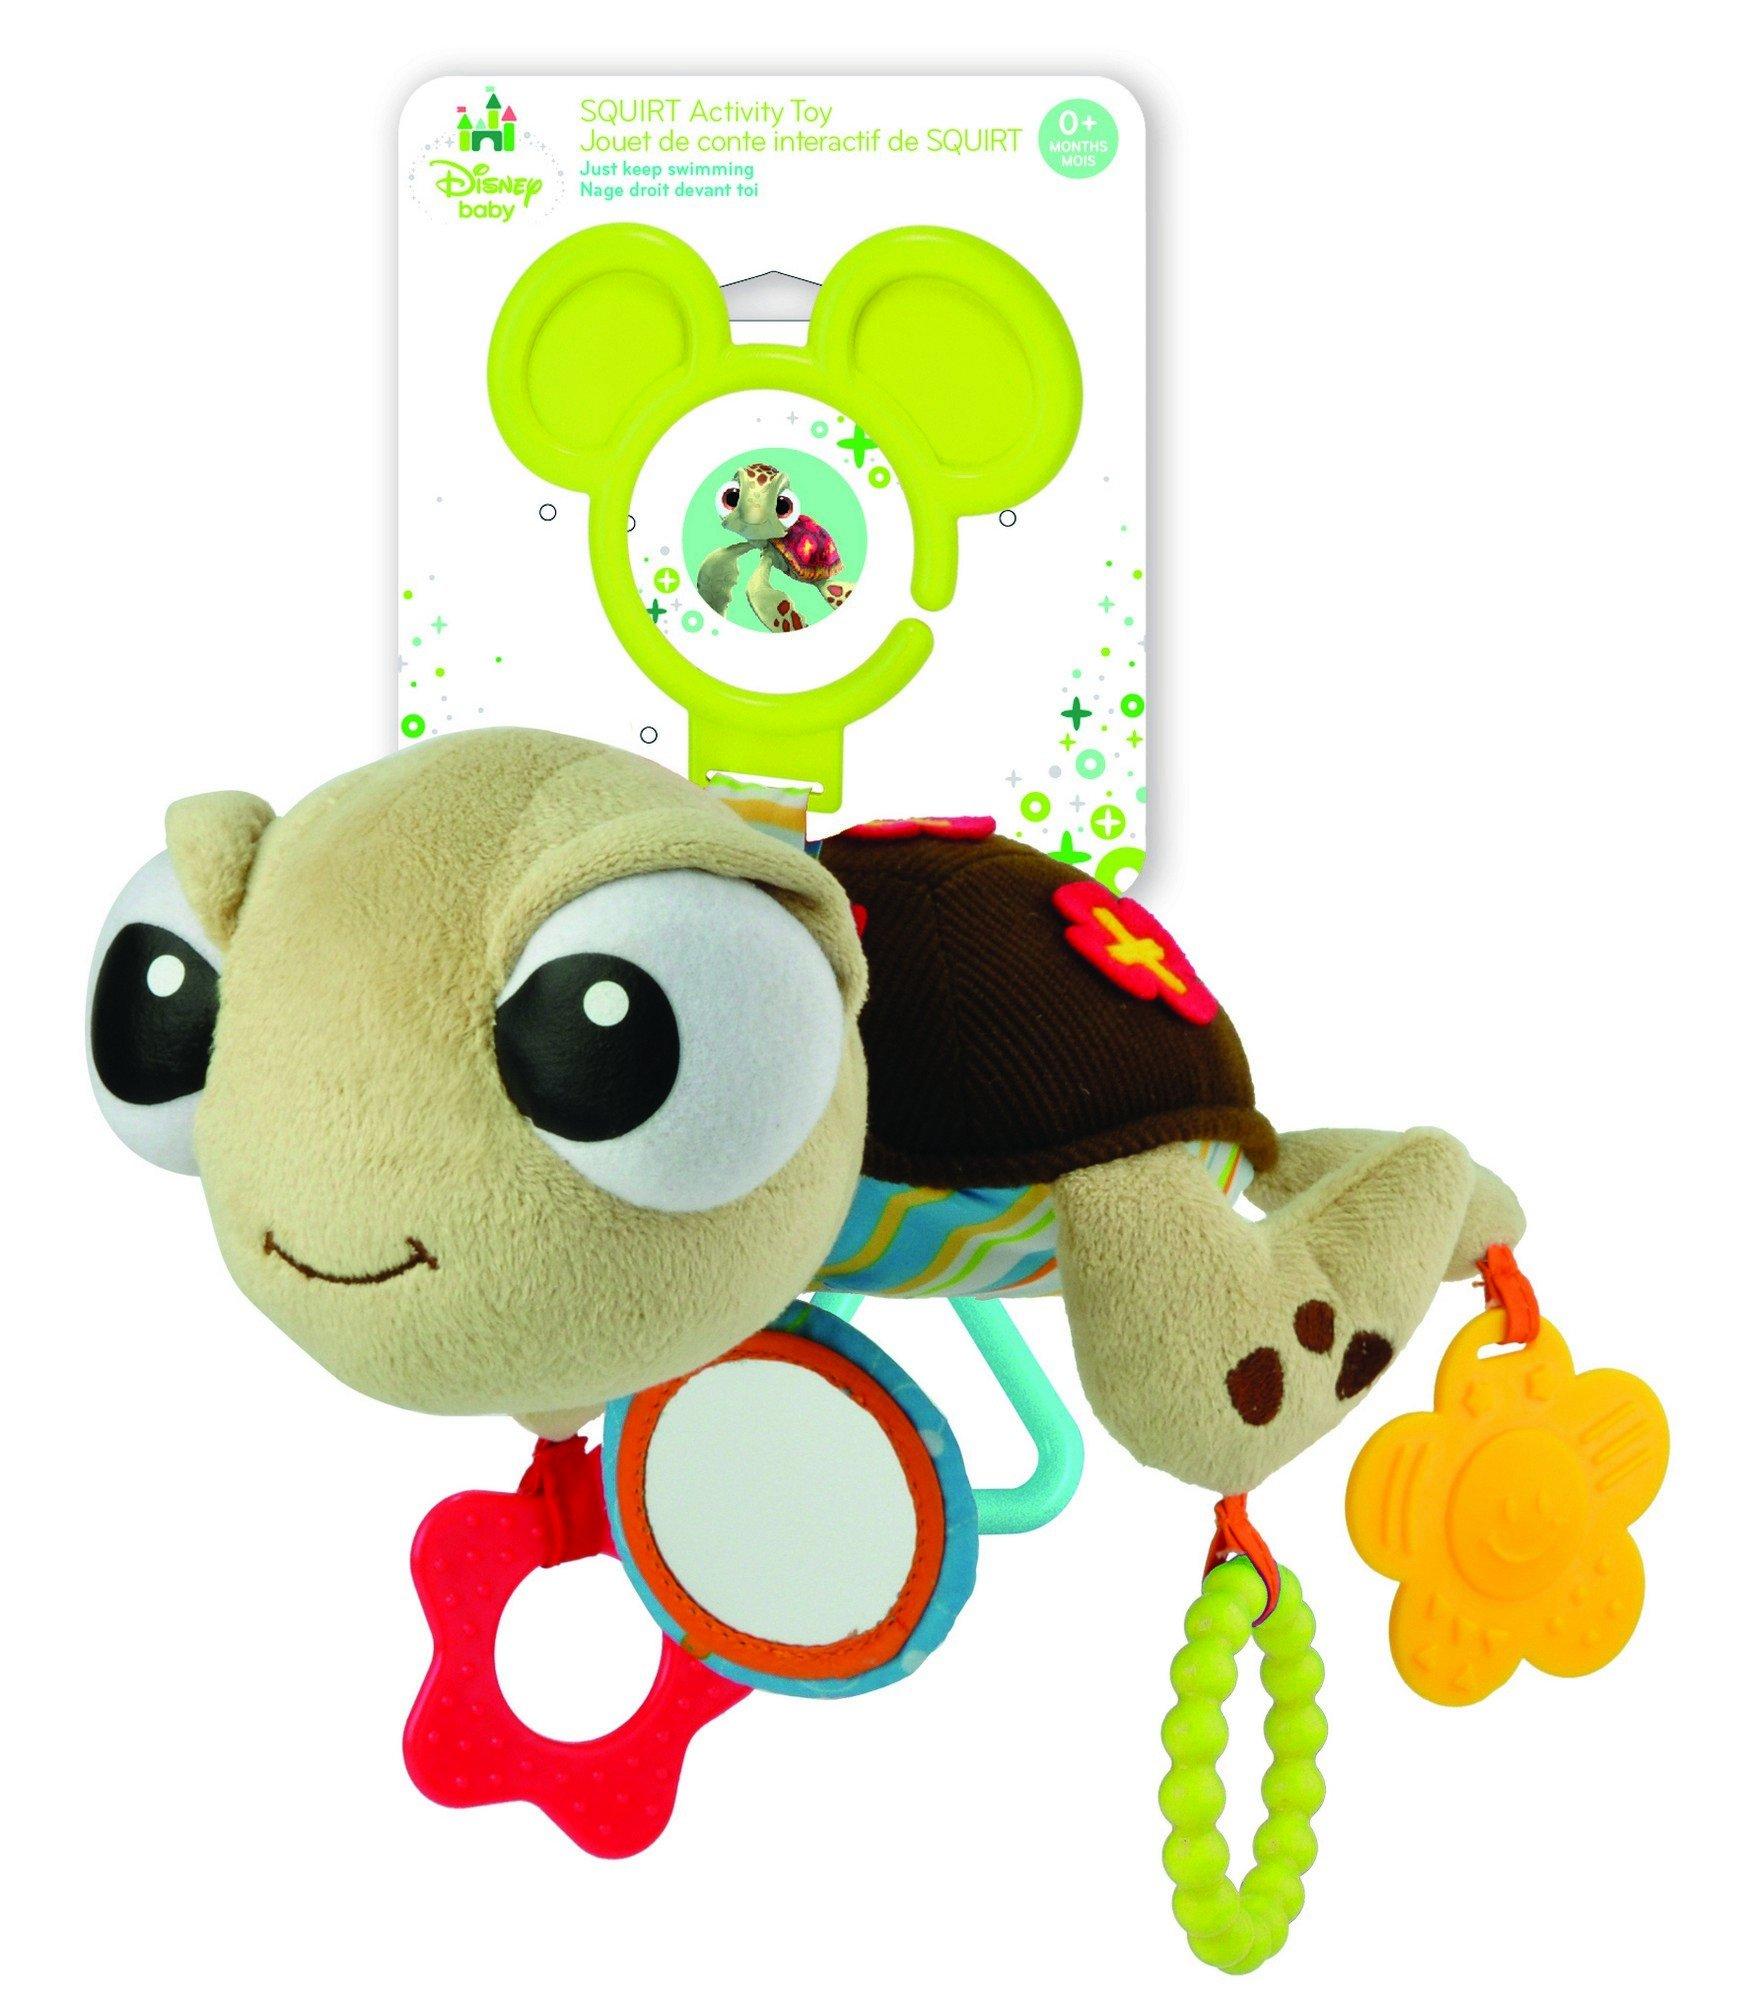 Amazon Com Disney Baby Finding Nemo Sea Of Activities